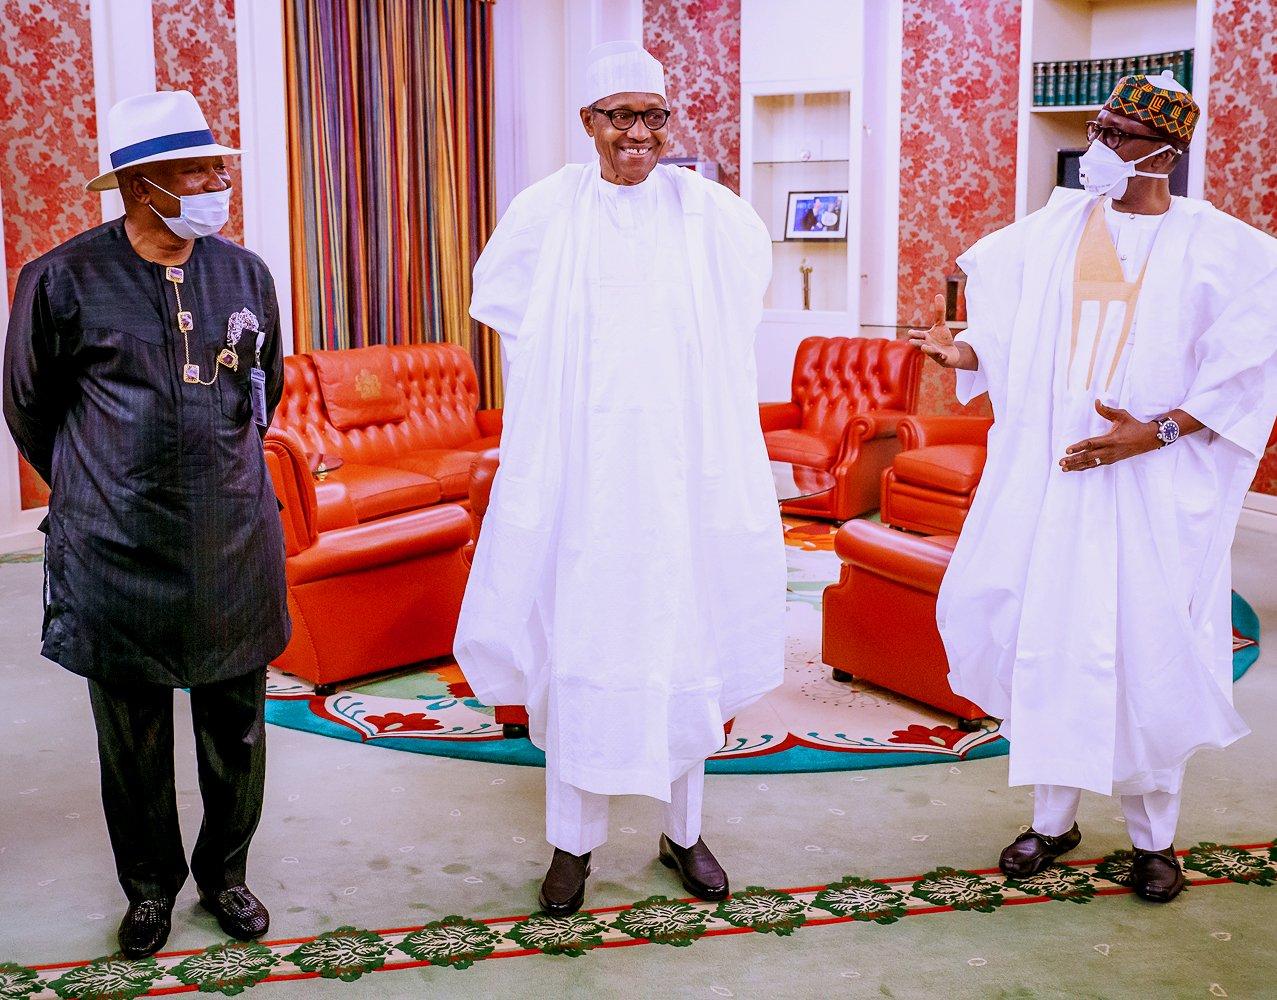 President Muhammadu Buhari(C) Major. Gen. Babagana Monguno (rtd), National Security Adviser (R) and Col. Milland Dikio (rtd), Interim Administrator, Presidential Amnesty Programme (L)